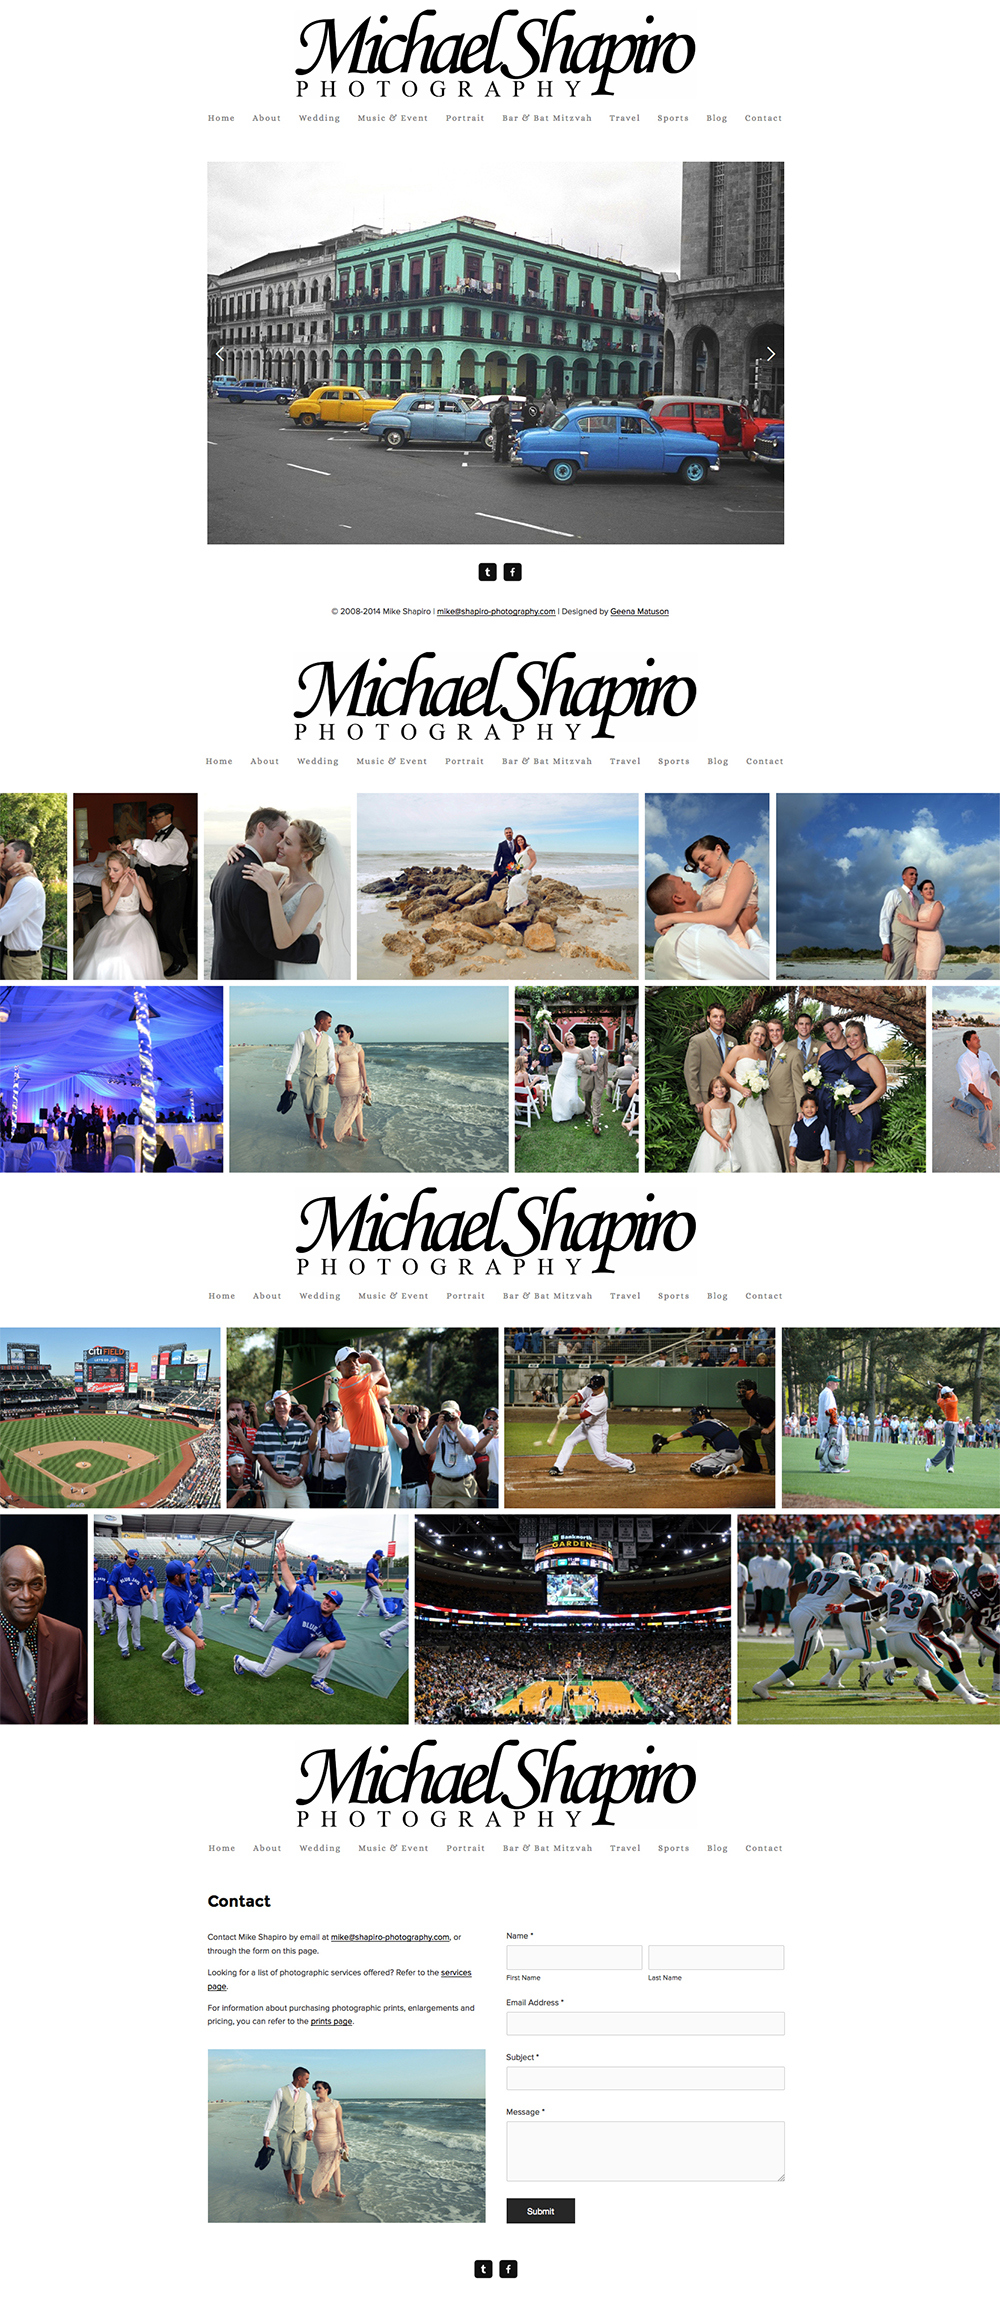 GeenaMatuson_MichaelShapiroPhotography_Webdesign.jpg